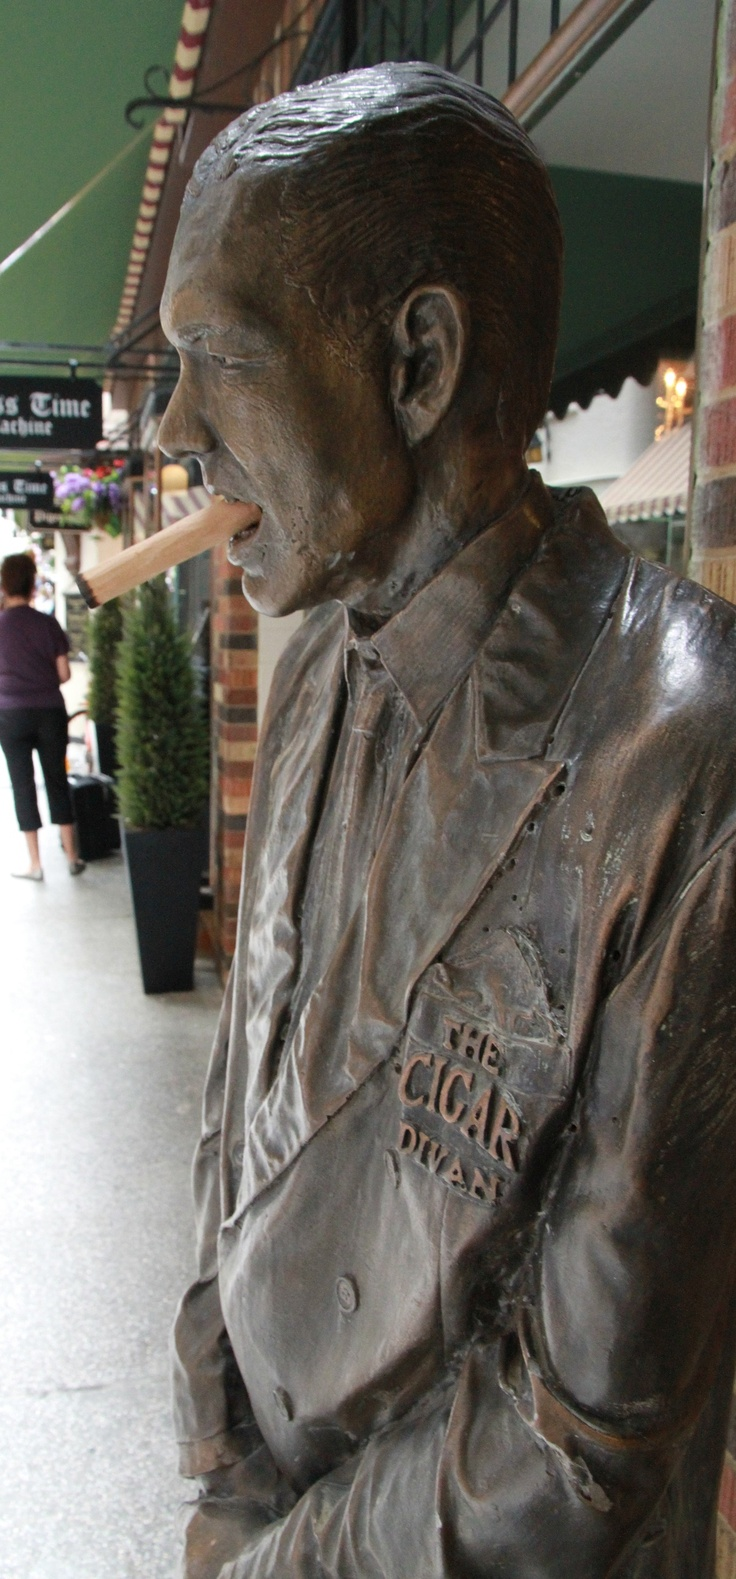 Cigar Man, Downtoen Perth: Photo